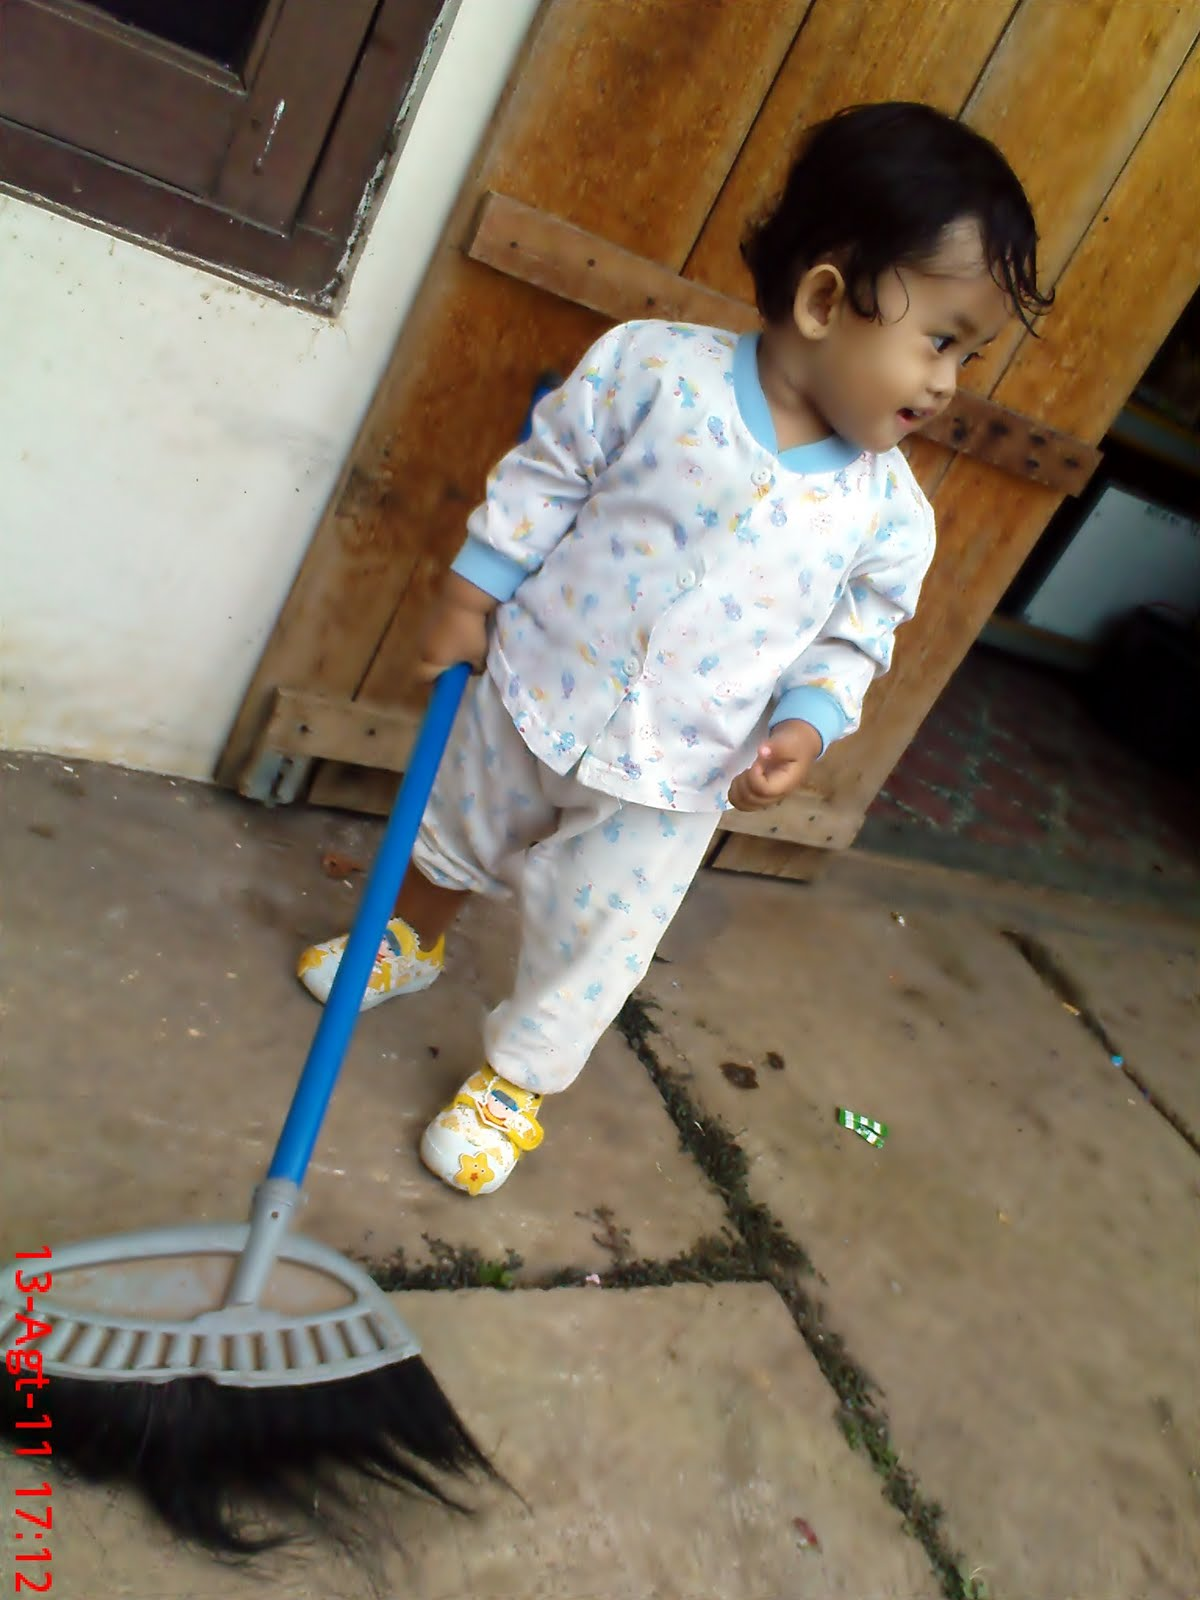 KAKEK PANKY Anak Kecil Lucu Menyapu